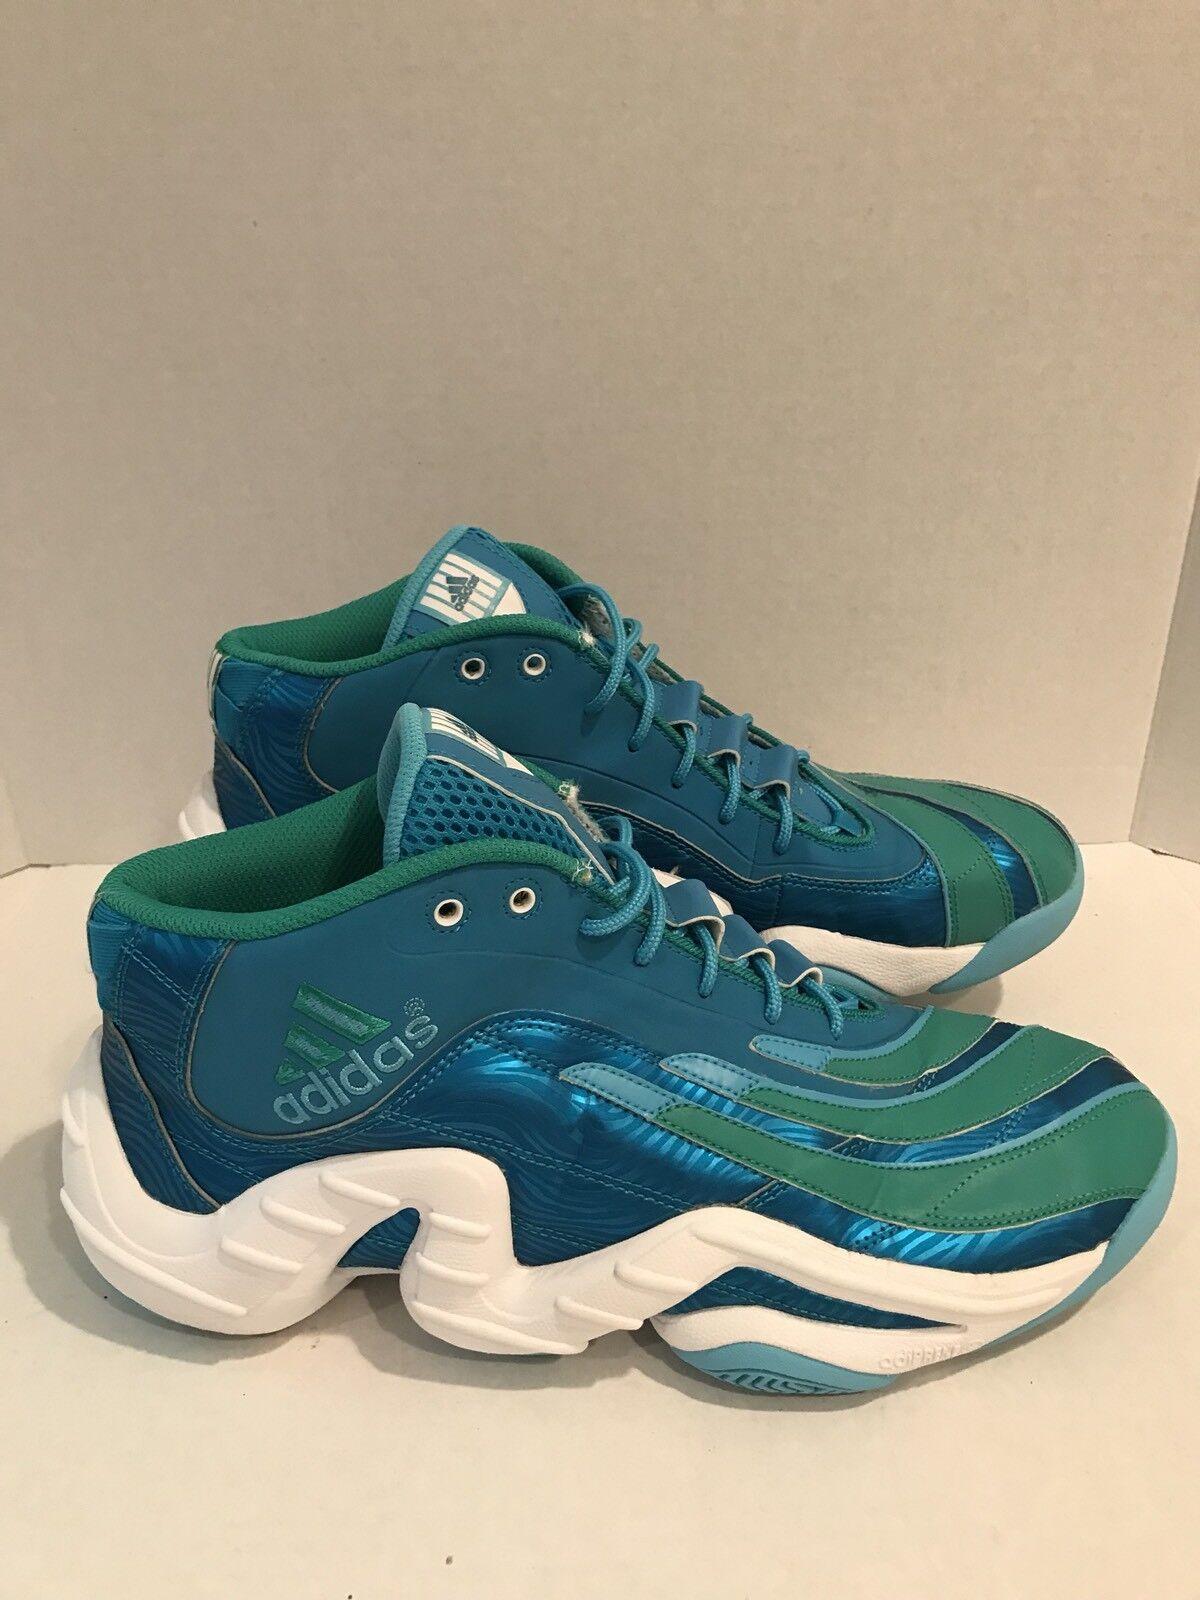 best service c42f1 a31d3 Спортивная обувь для мужчины Adidas Real Deal Retro Basketball Sneakers  Q32864 Teal White Men s Sz 12 - 292848285872 - (США)